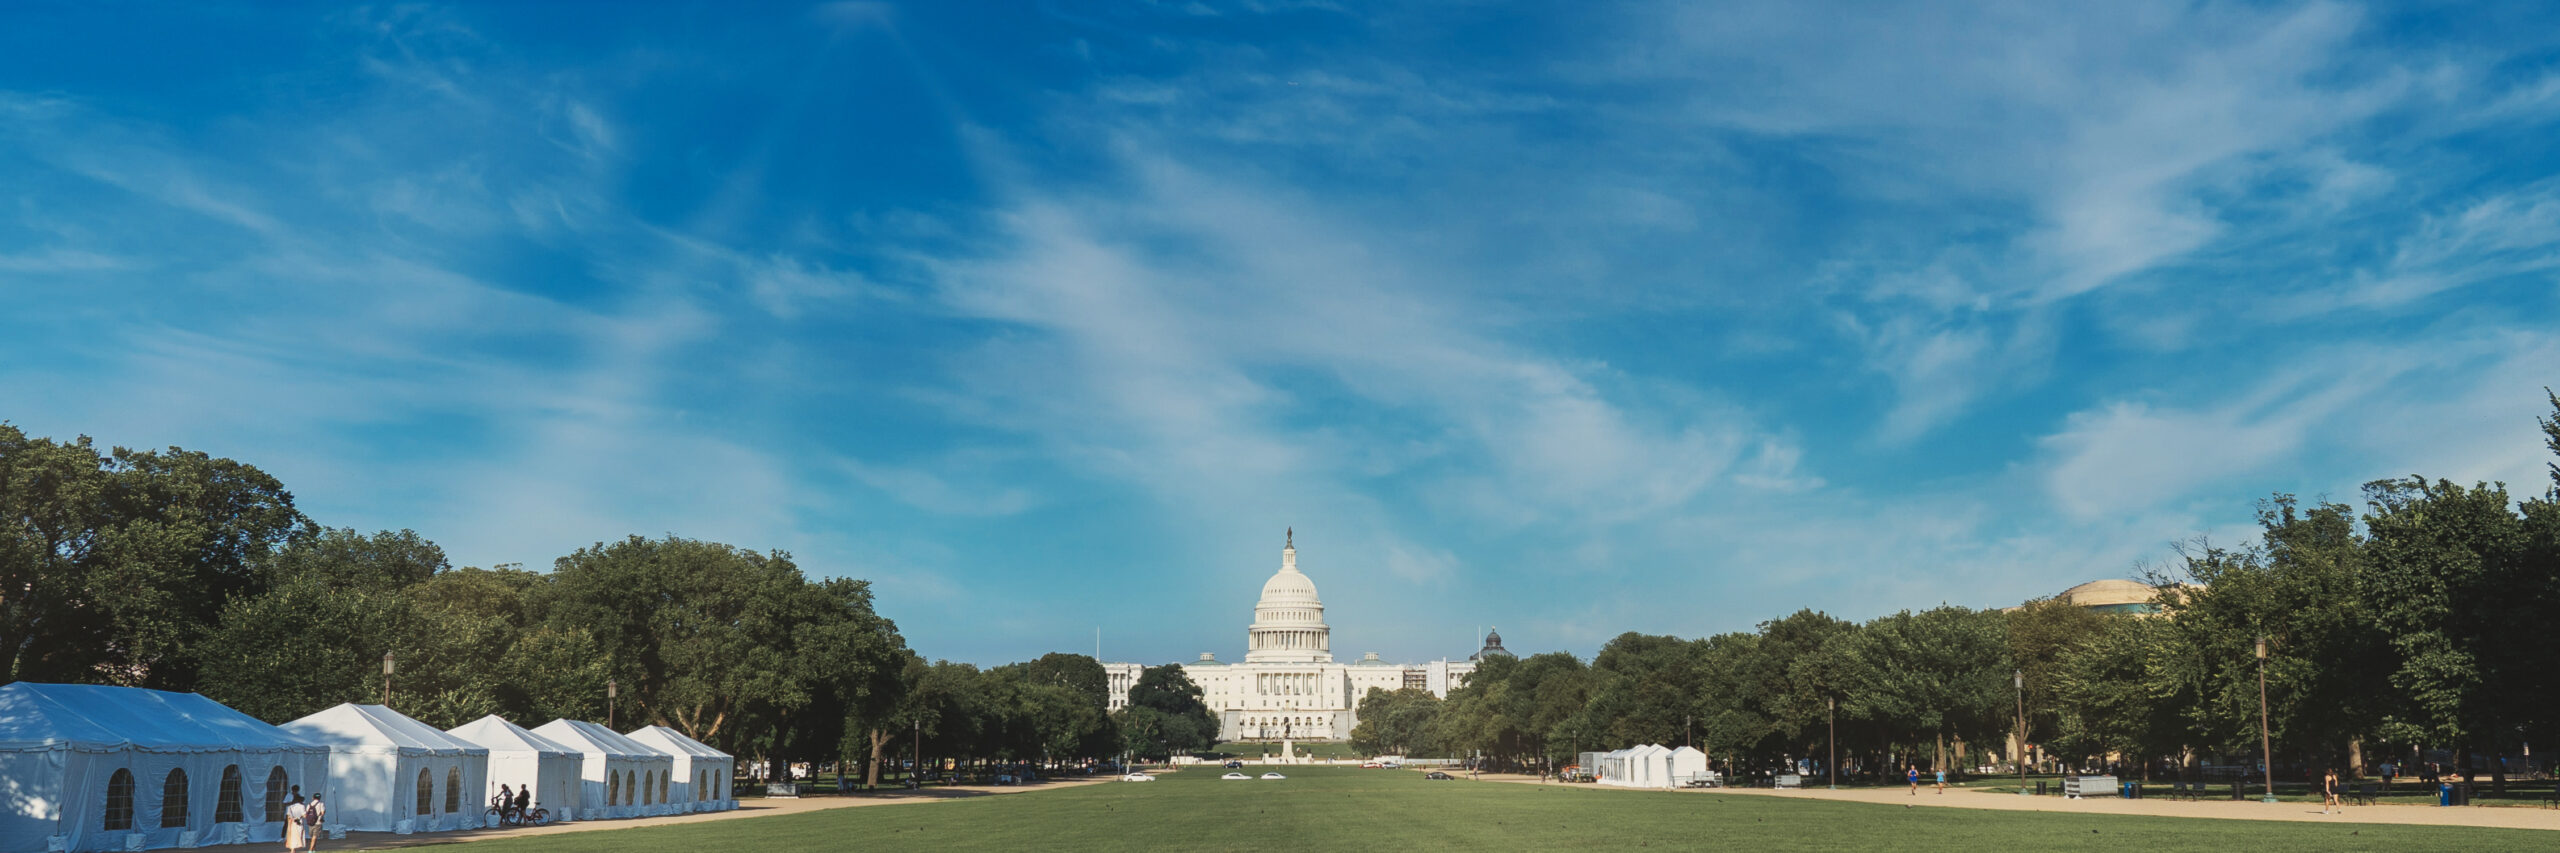 US Capitol Building Panoramic